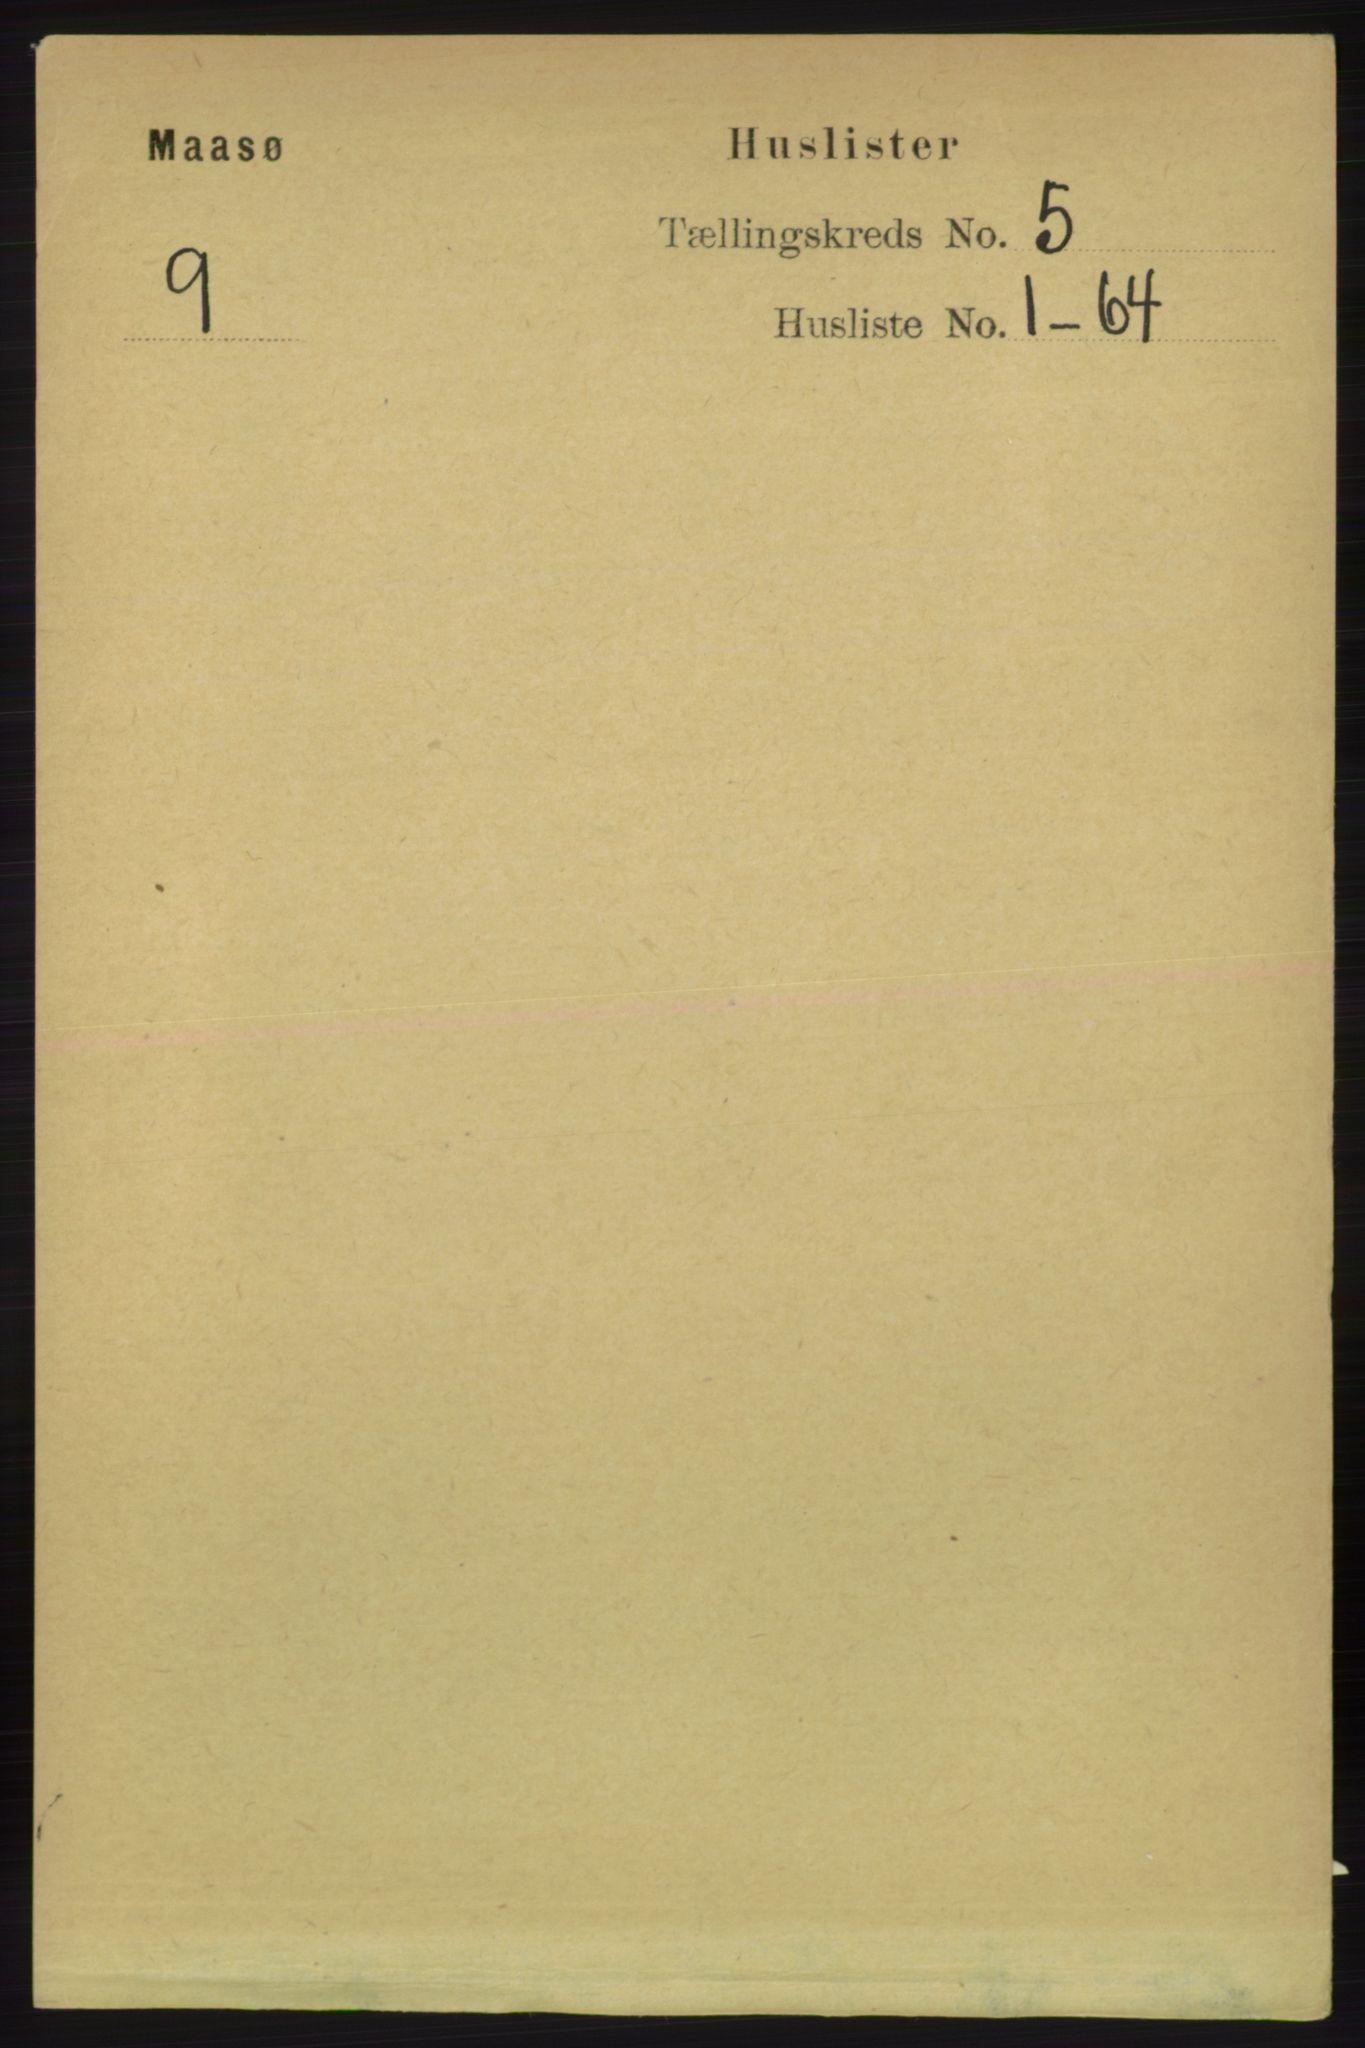 RA, Folketelling 1891 for 2018 Måsøy herred, 1891, s. 654